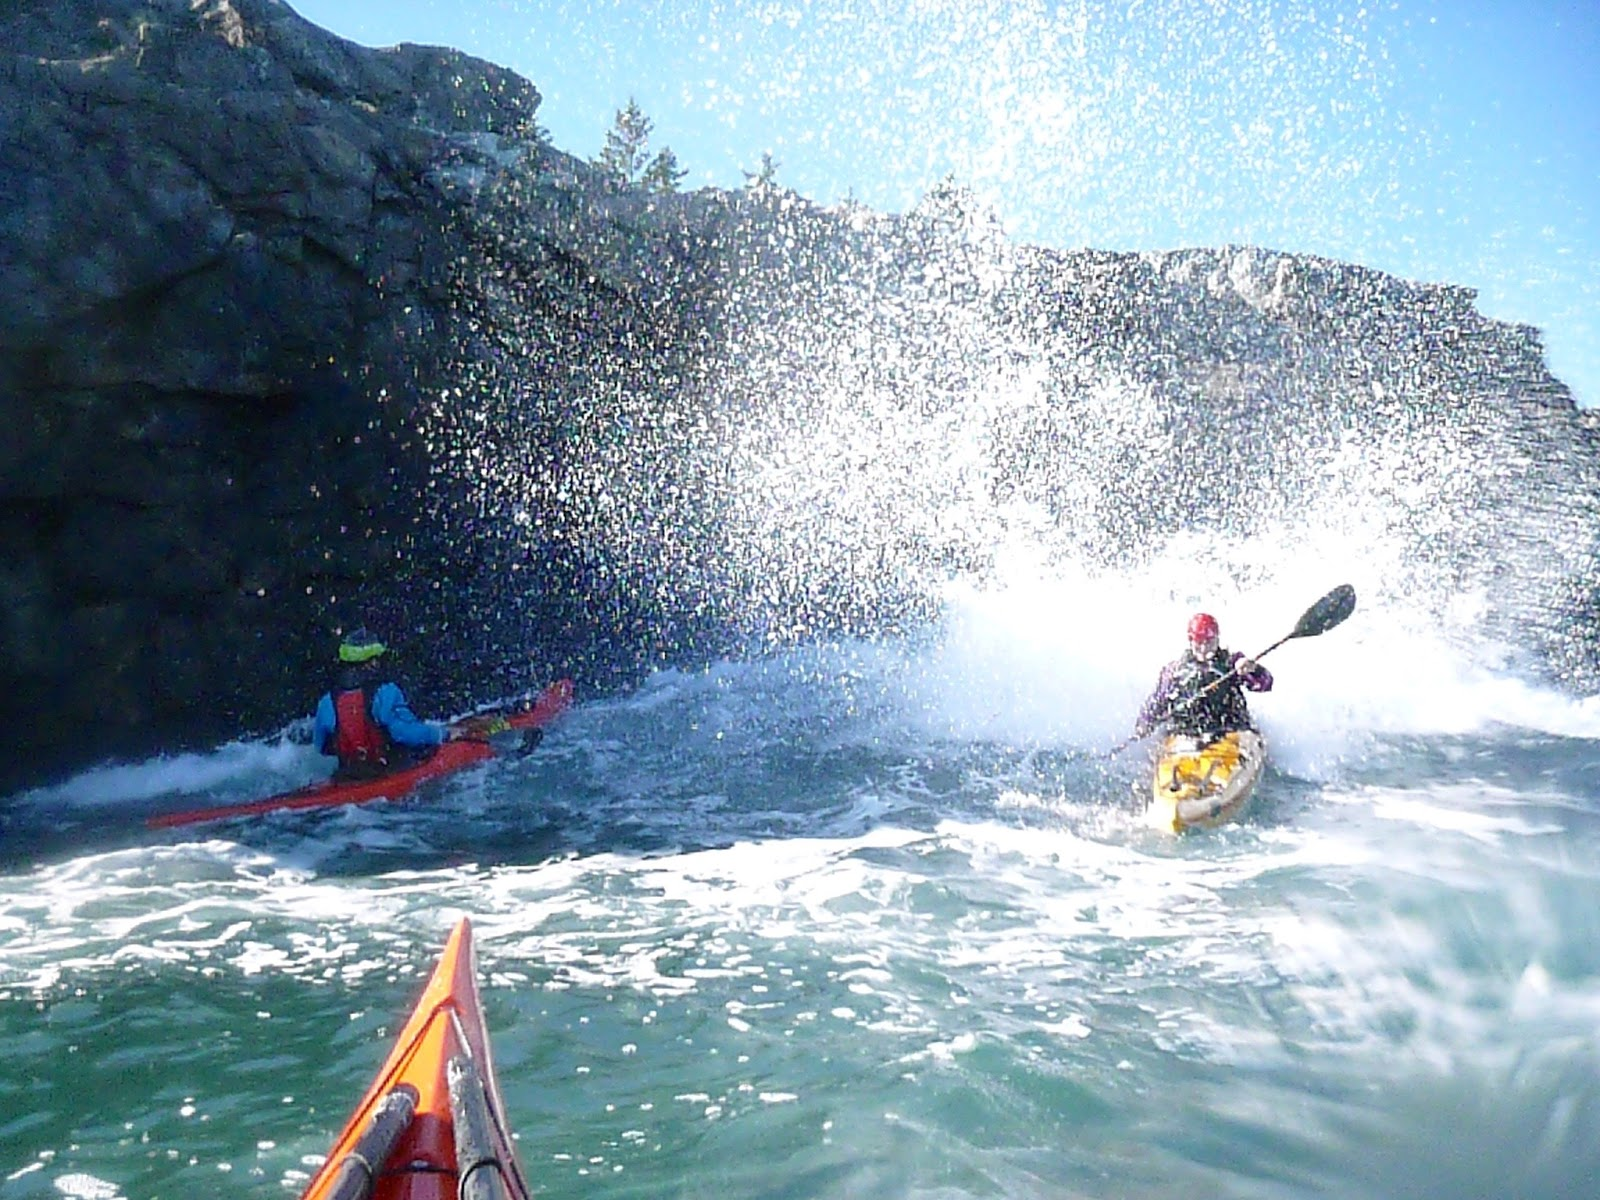 Sea Kayak Stonington Otter Cove To Bar Harbor Or Riding A Giant